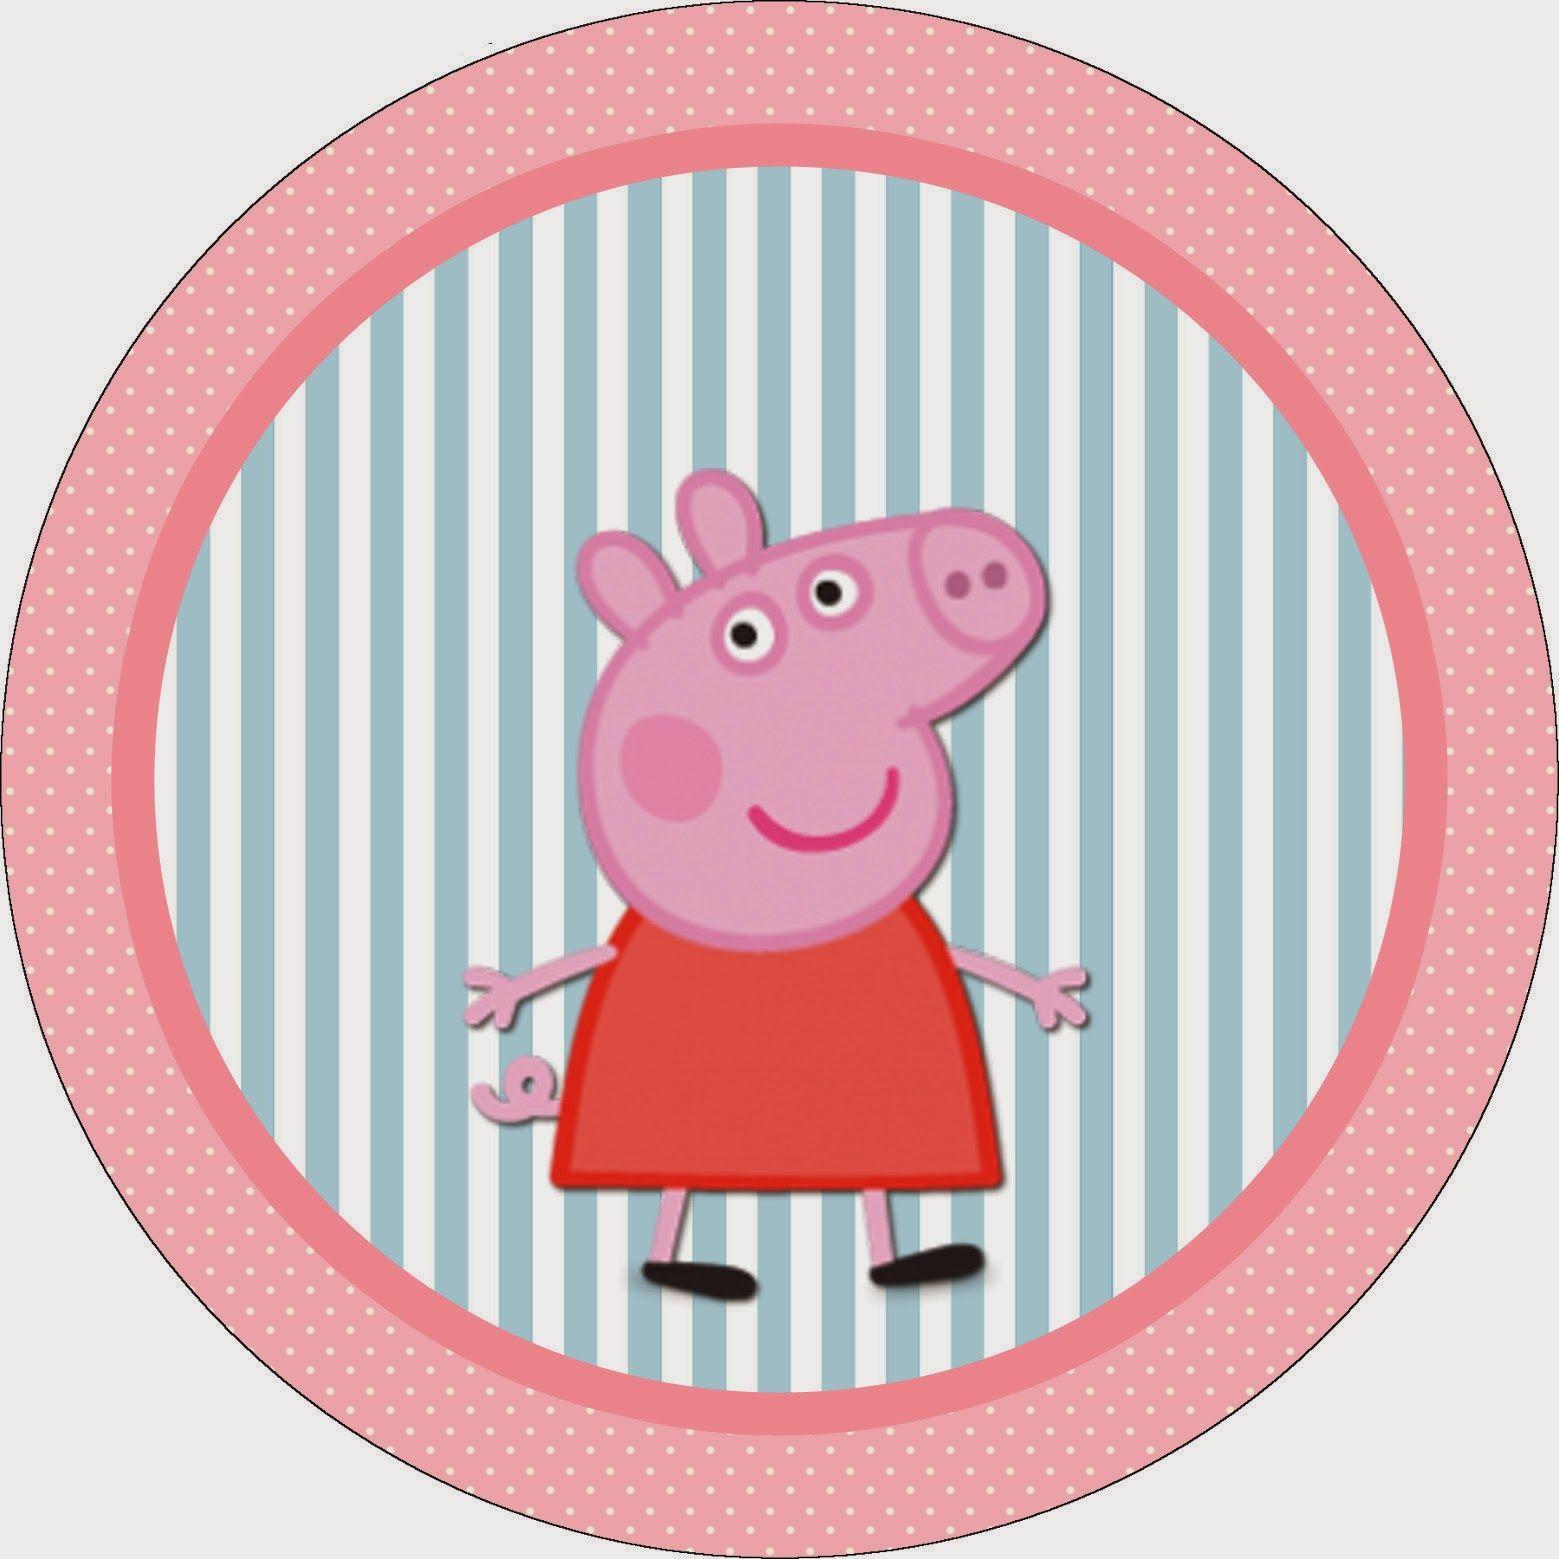 Fine Peppa Pig Party Invitations Template Composition - Invitations ...